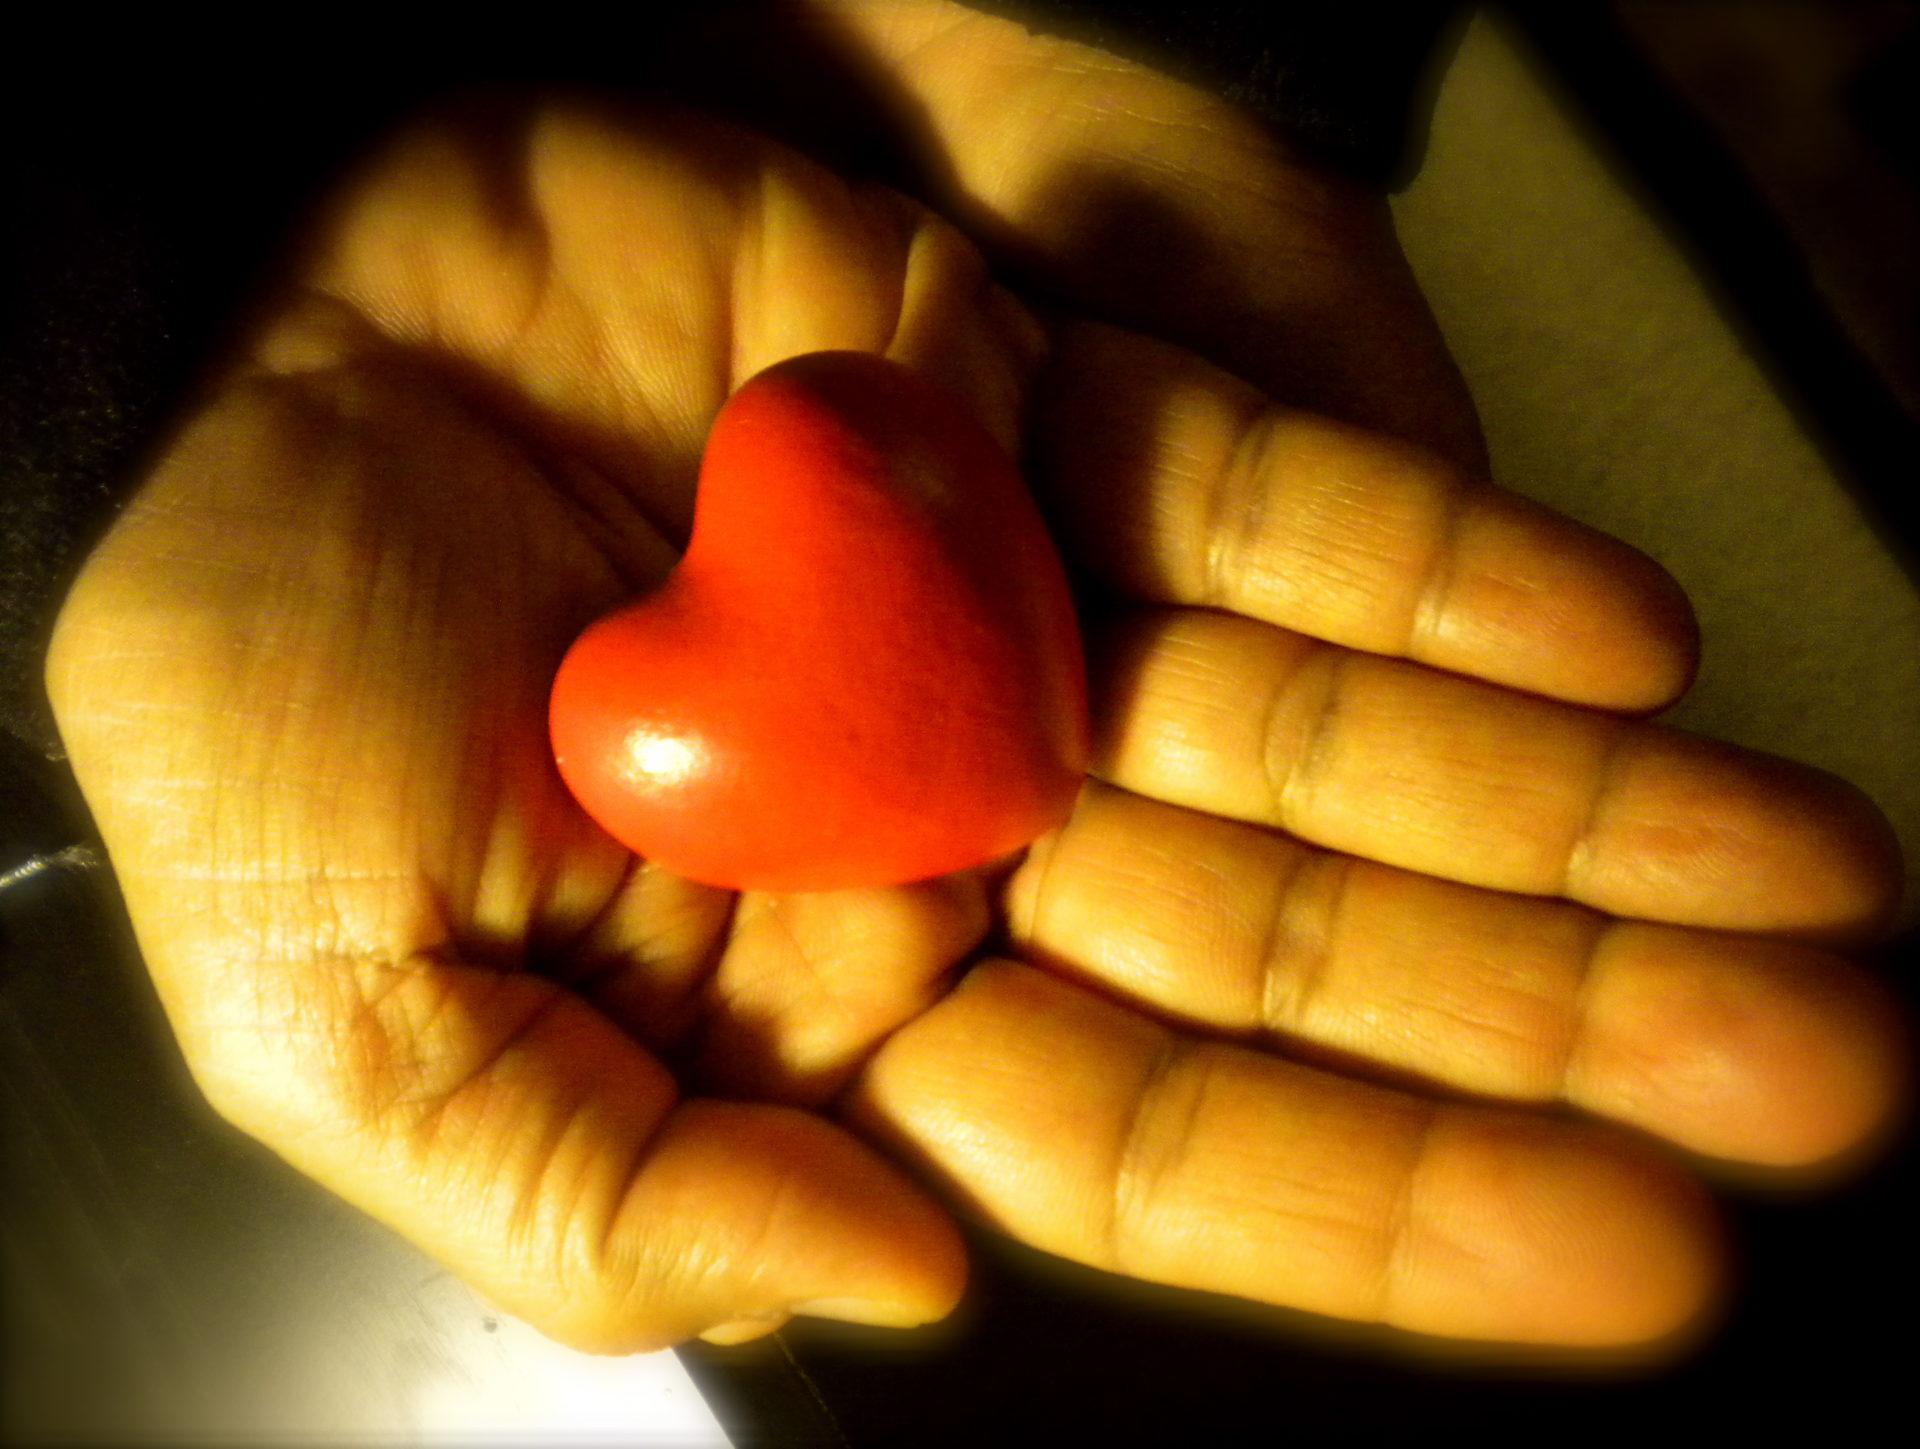 kindness & compassion